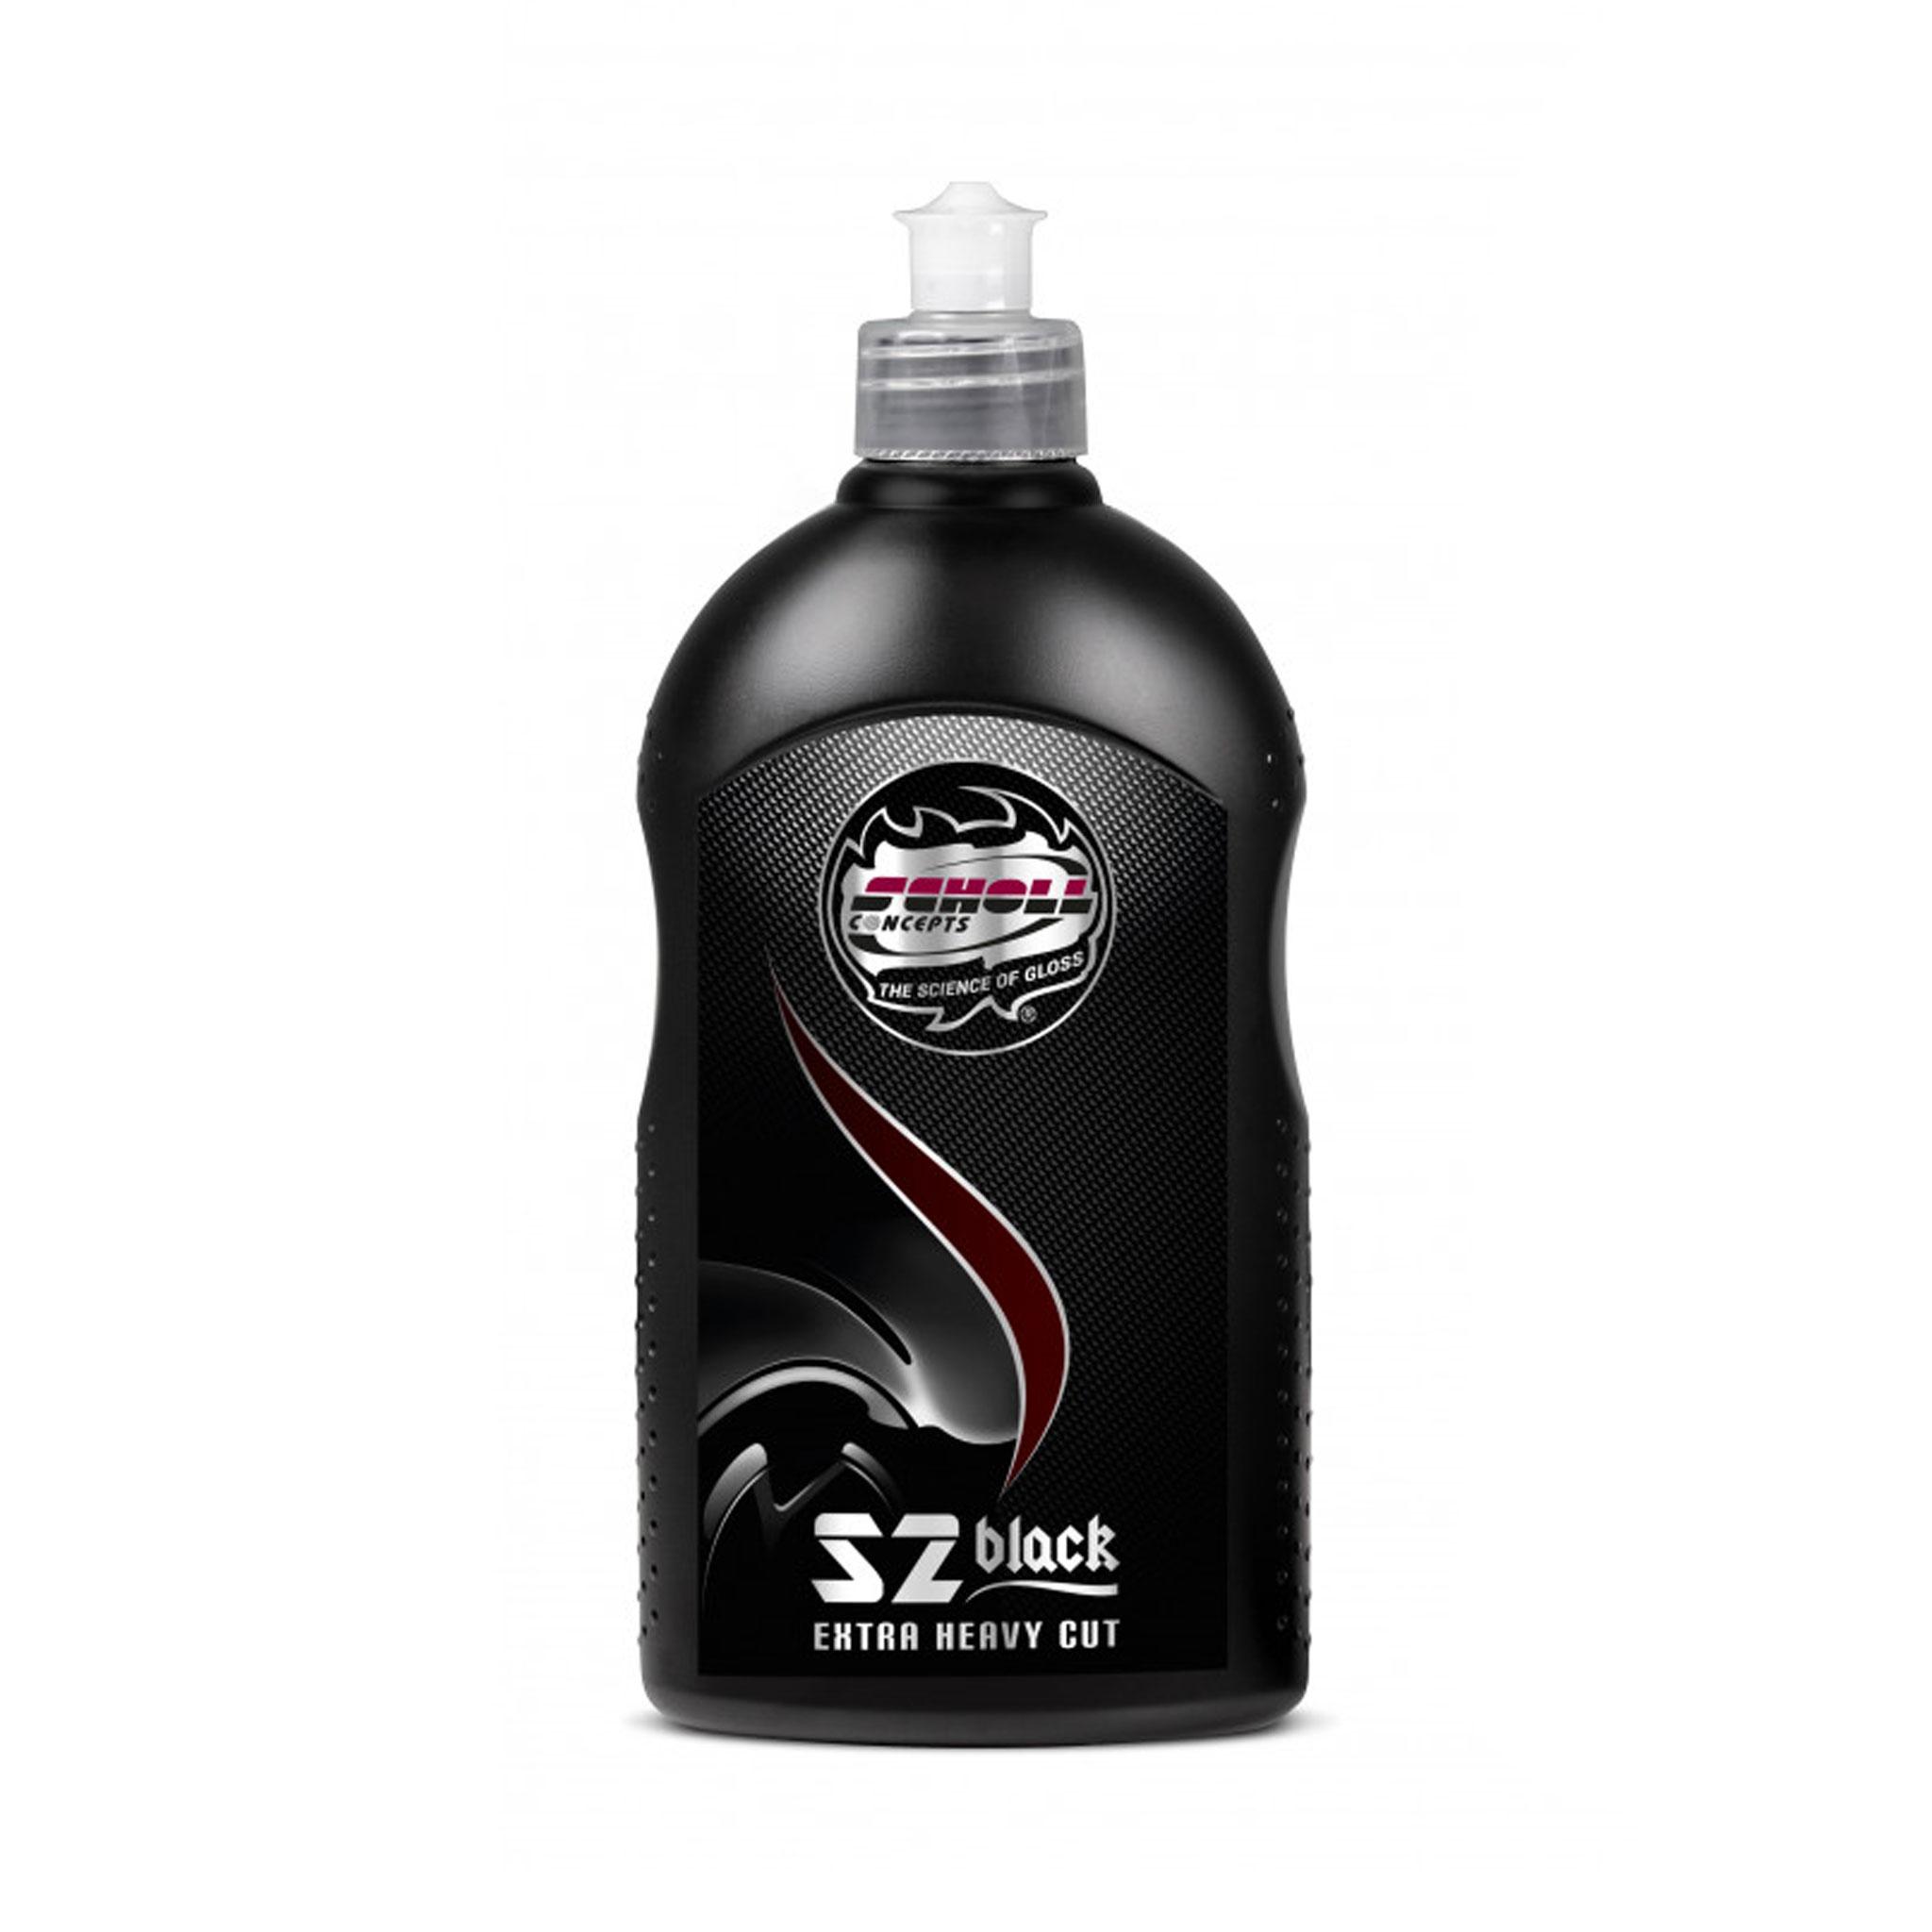 Polermedel Scholl Concepts S2 Black, 500 g